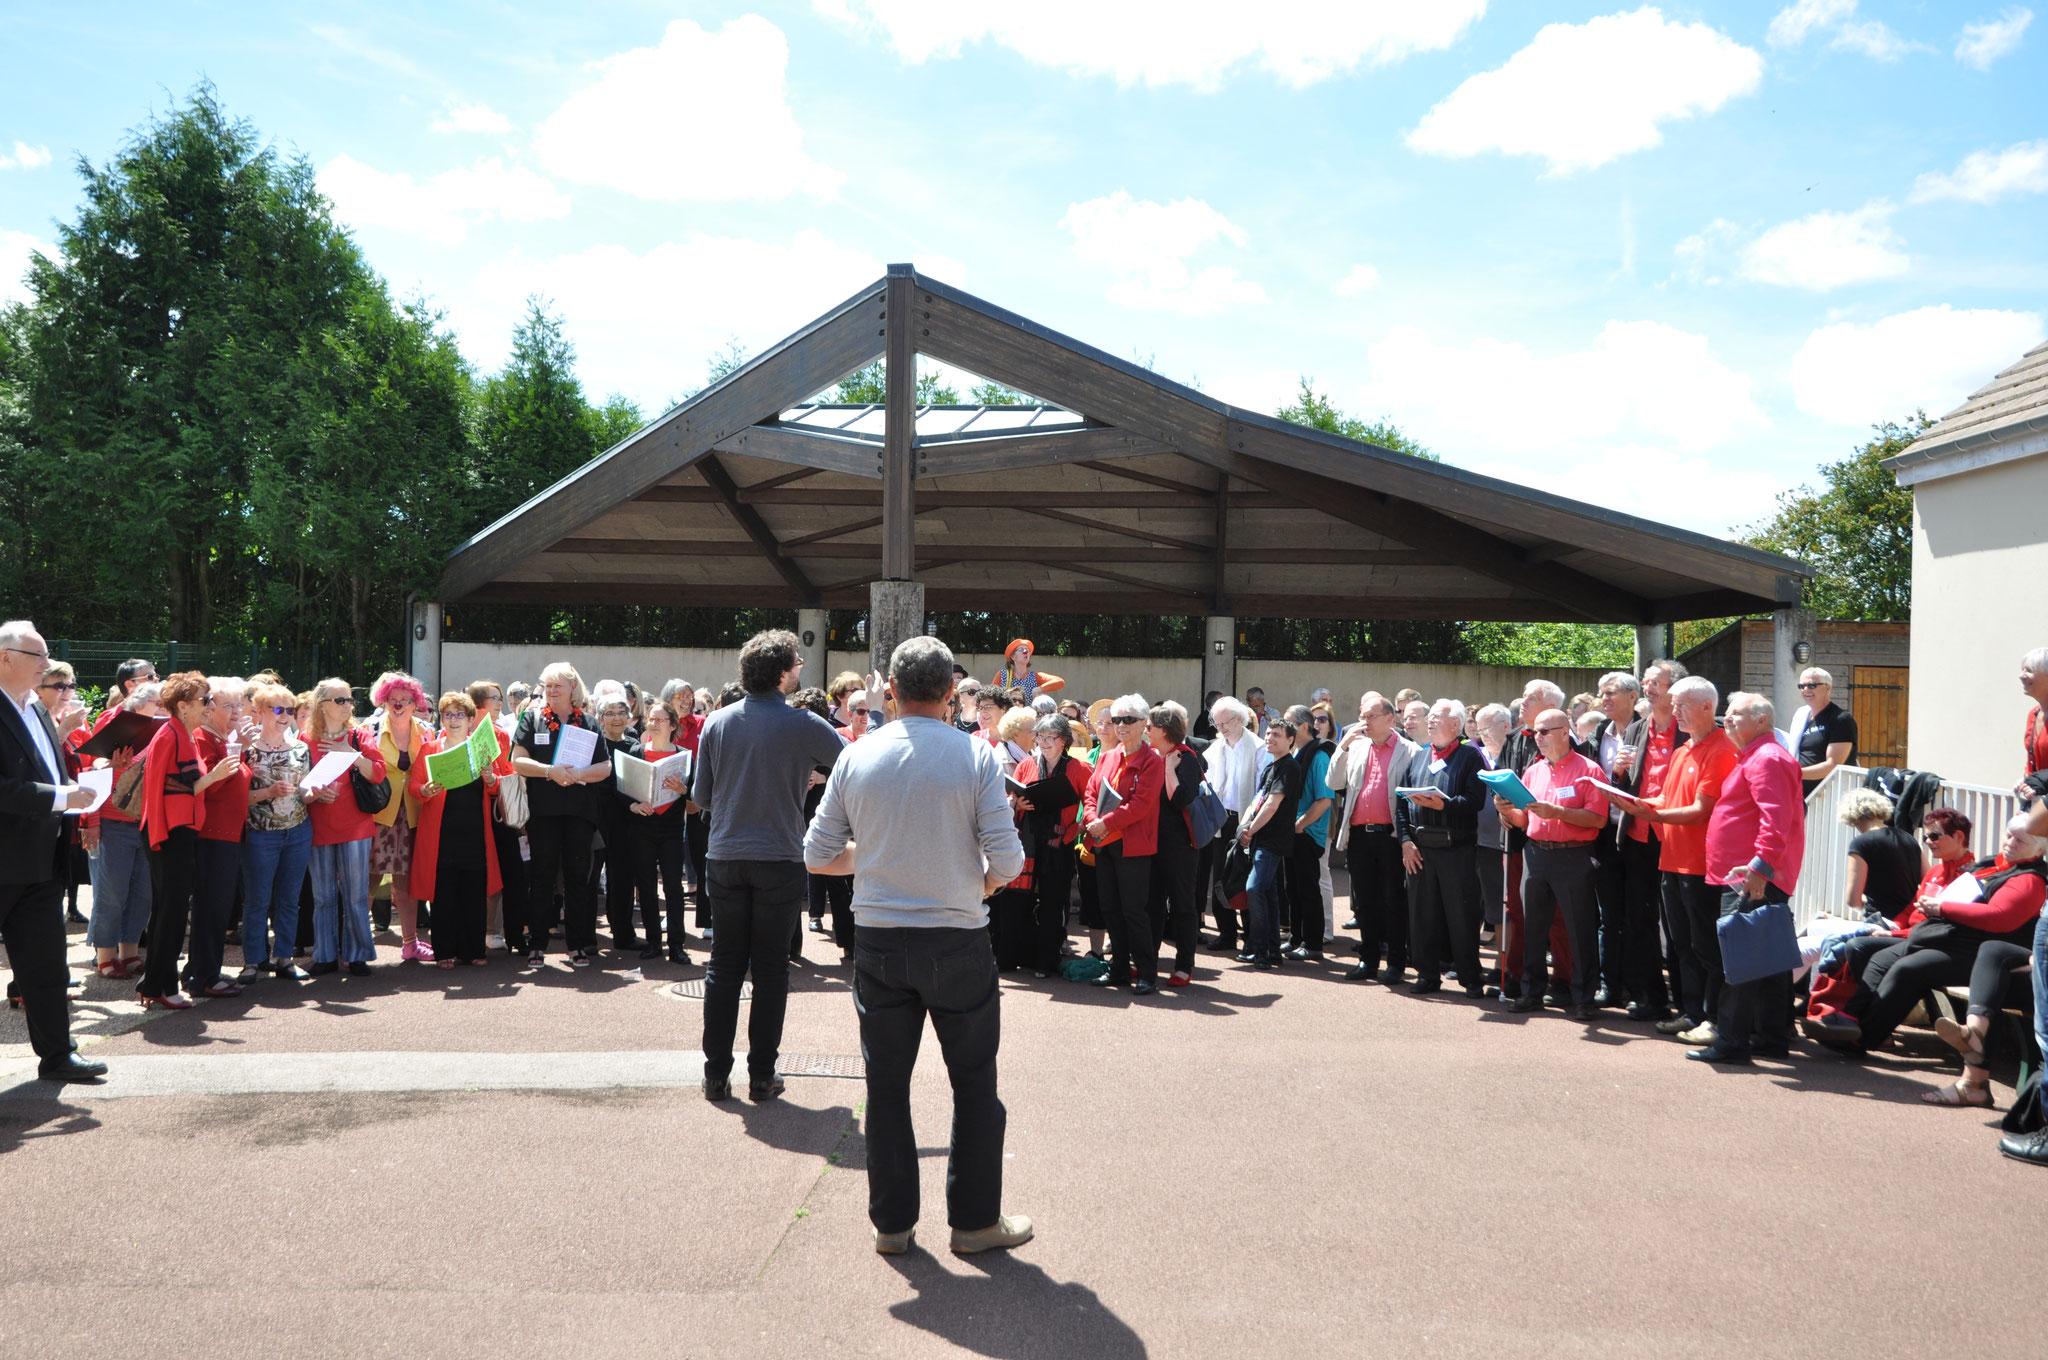 Festival des chorales 2017 à Prunay